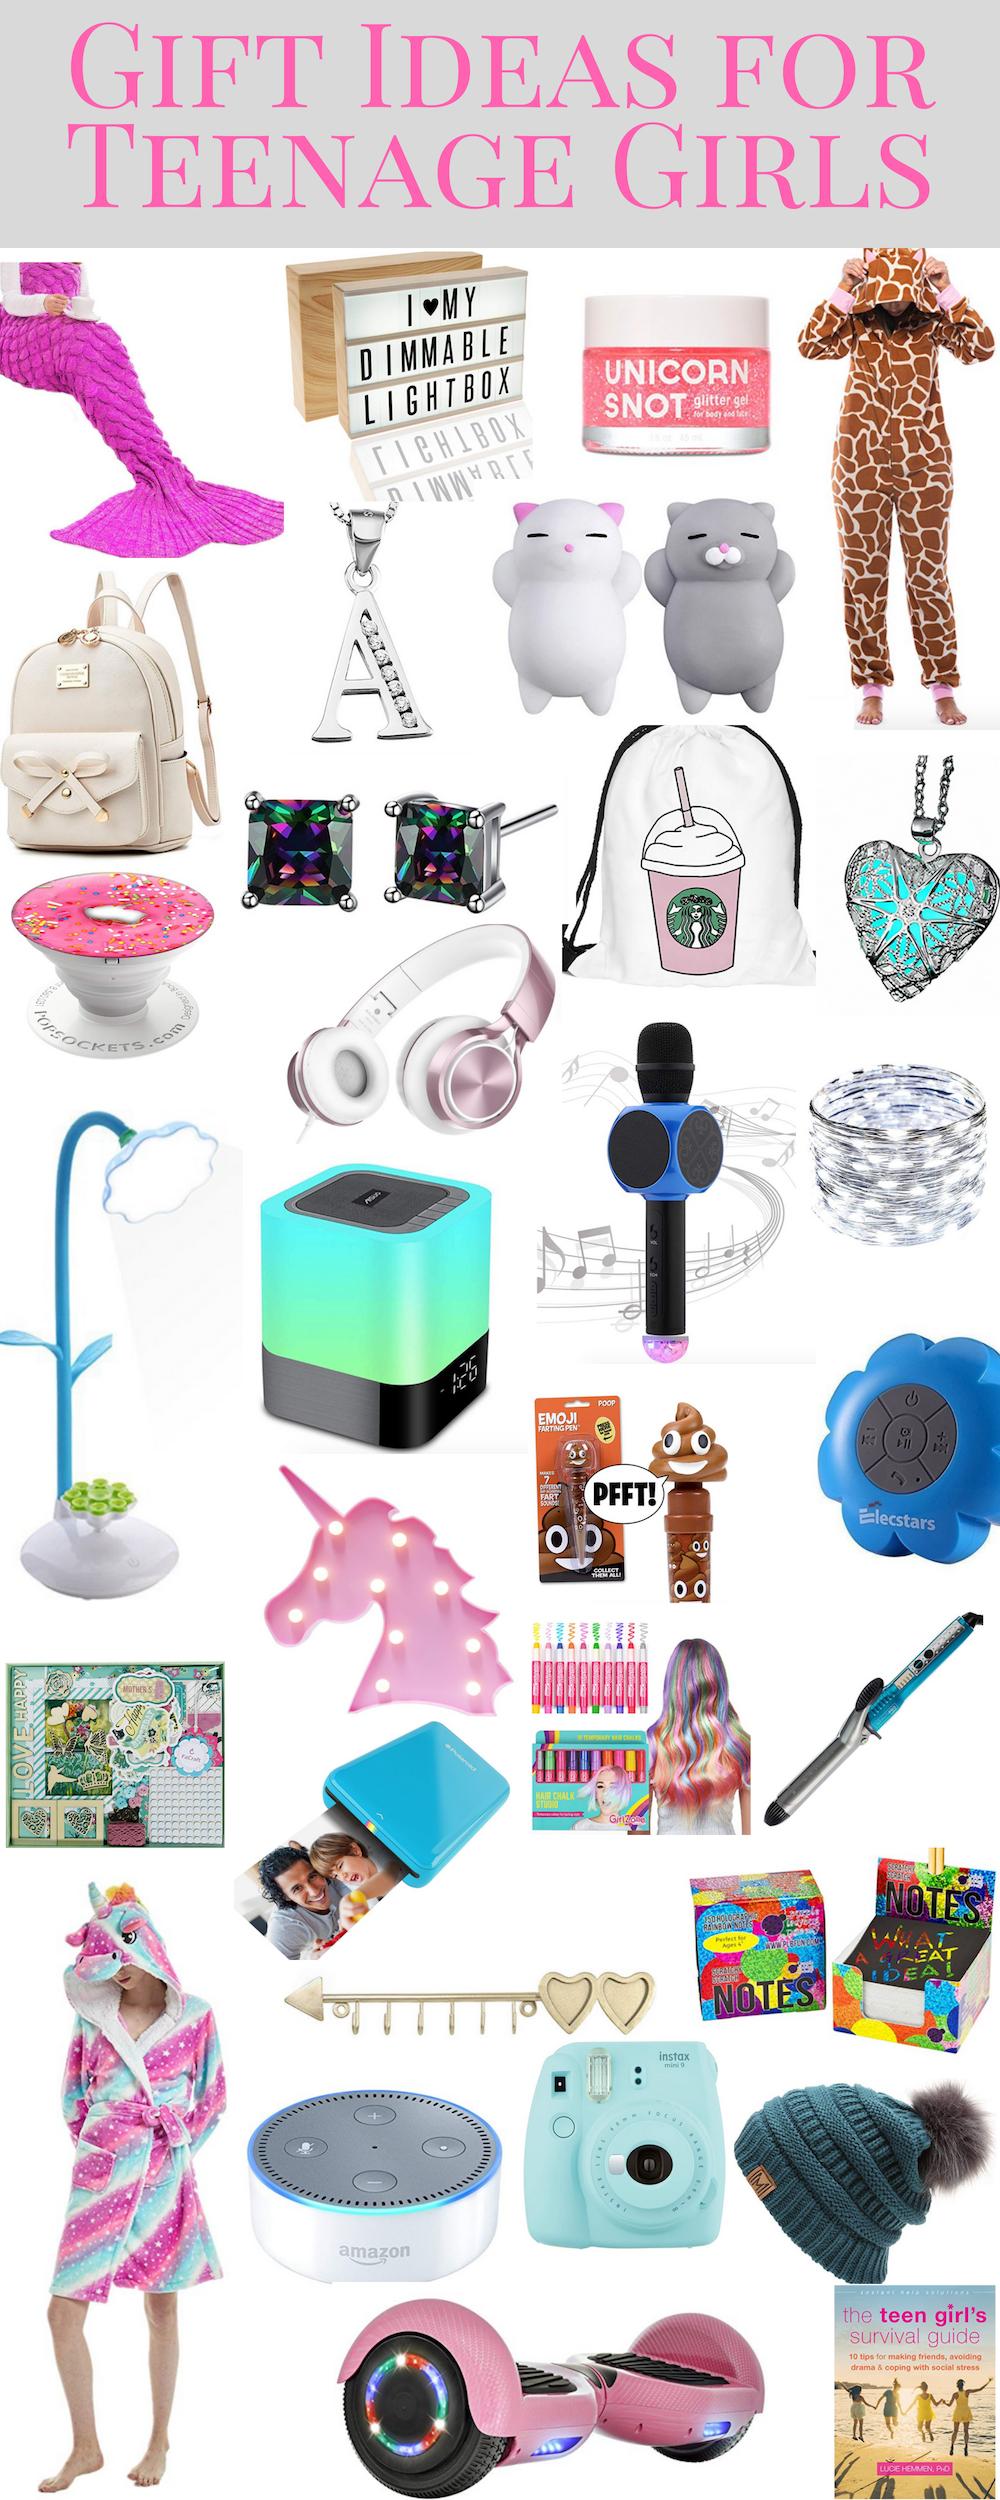 Gift Ideas for Teenage Girls and Tween Girls.